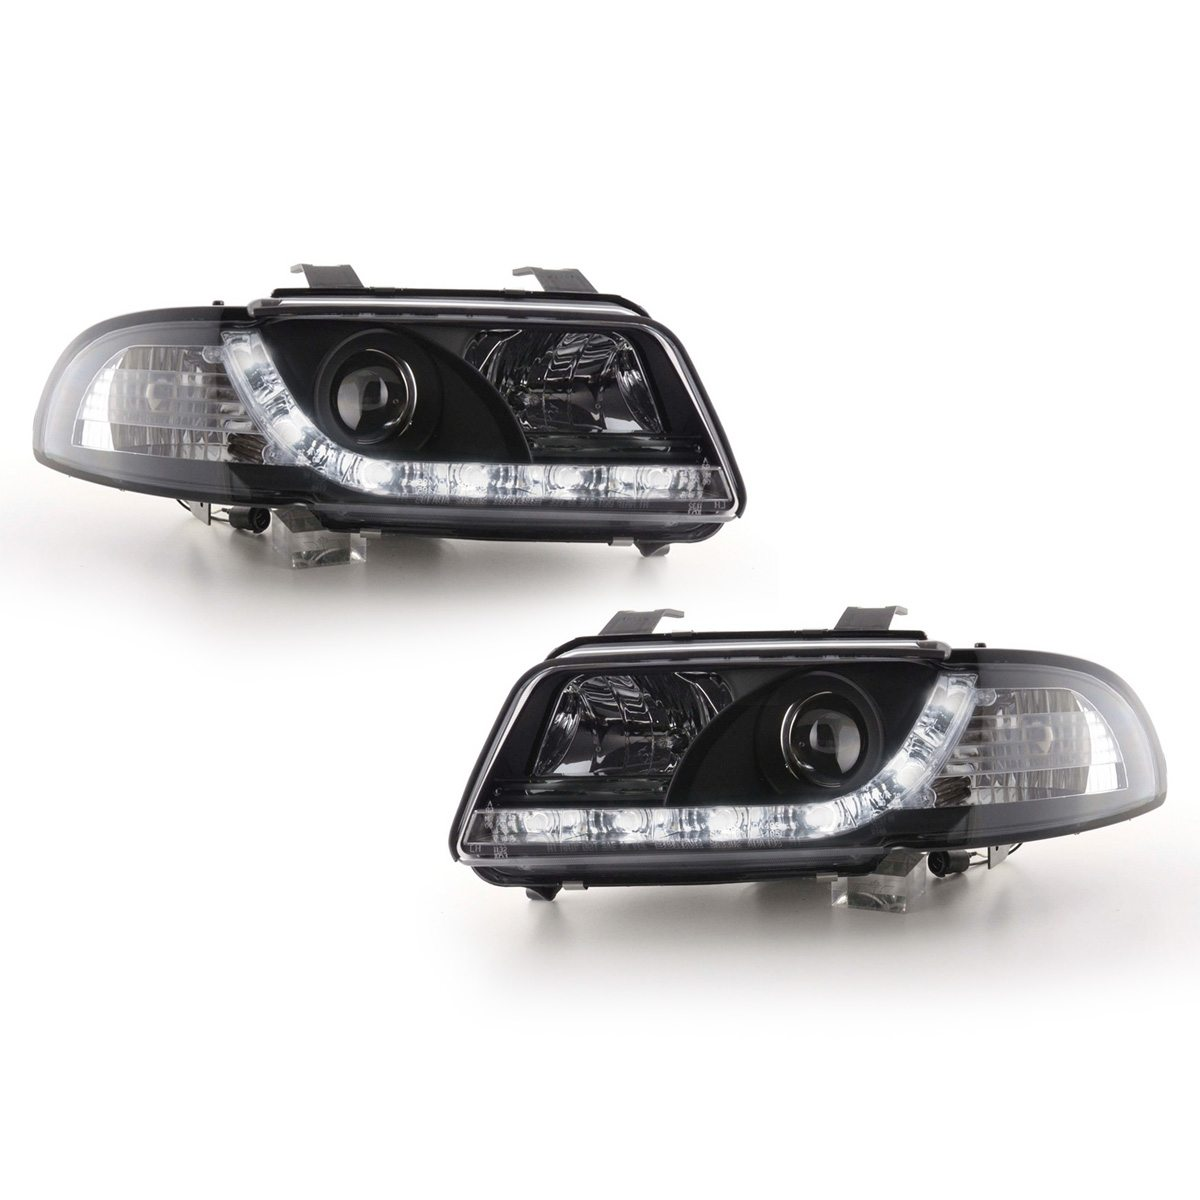 Audi-A4-B5-LimAvant-99-00-Faróis-Angel-Eyes-Dayline-Pretos-1